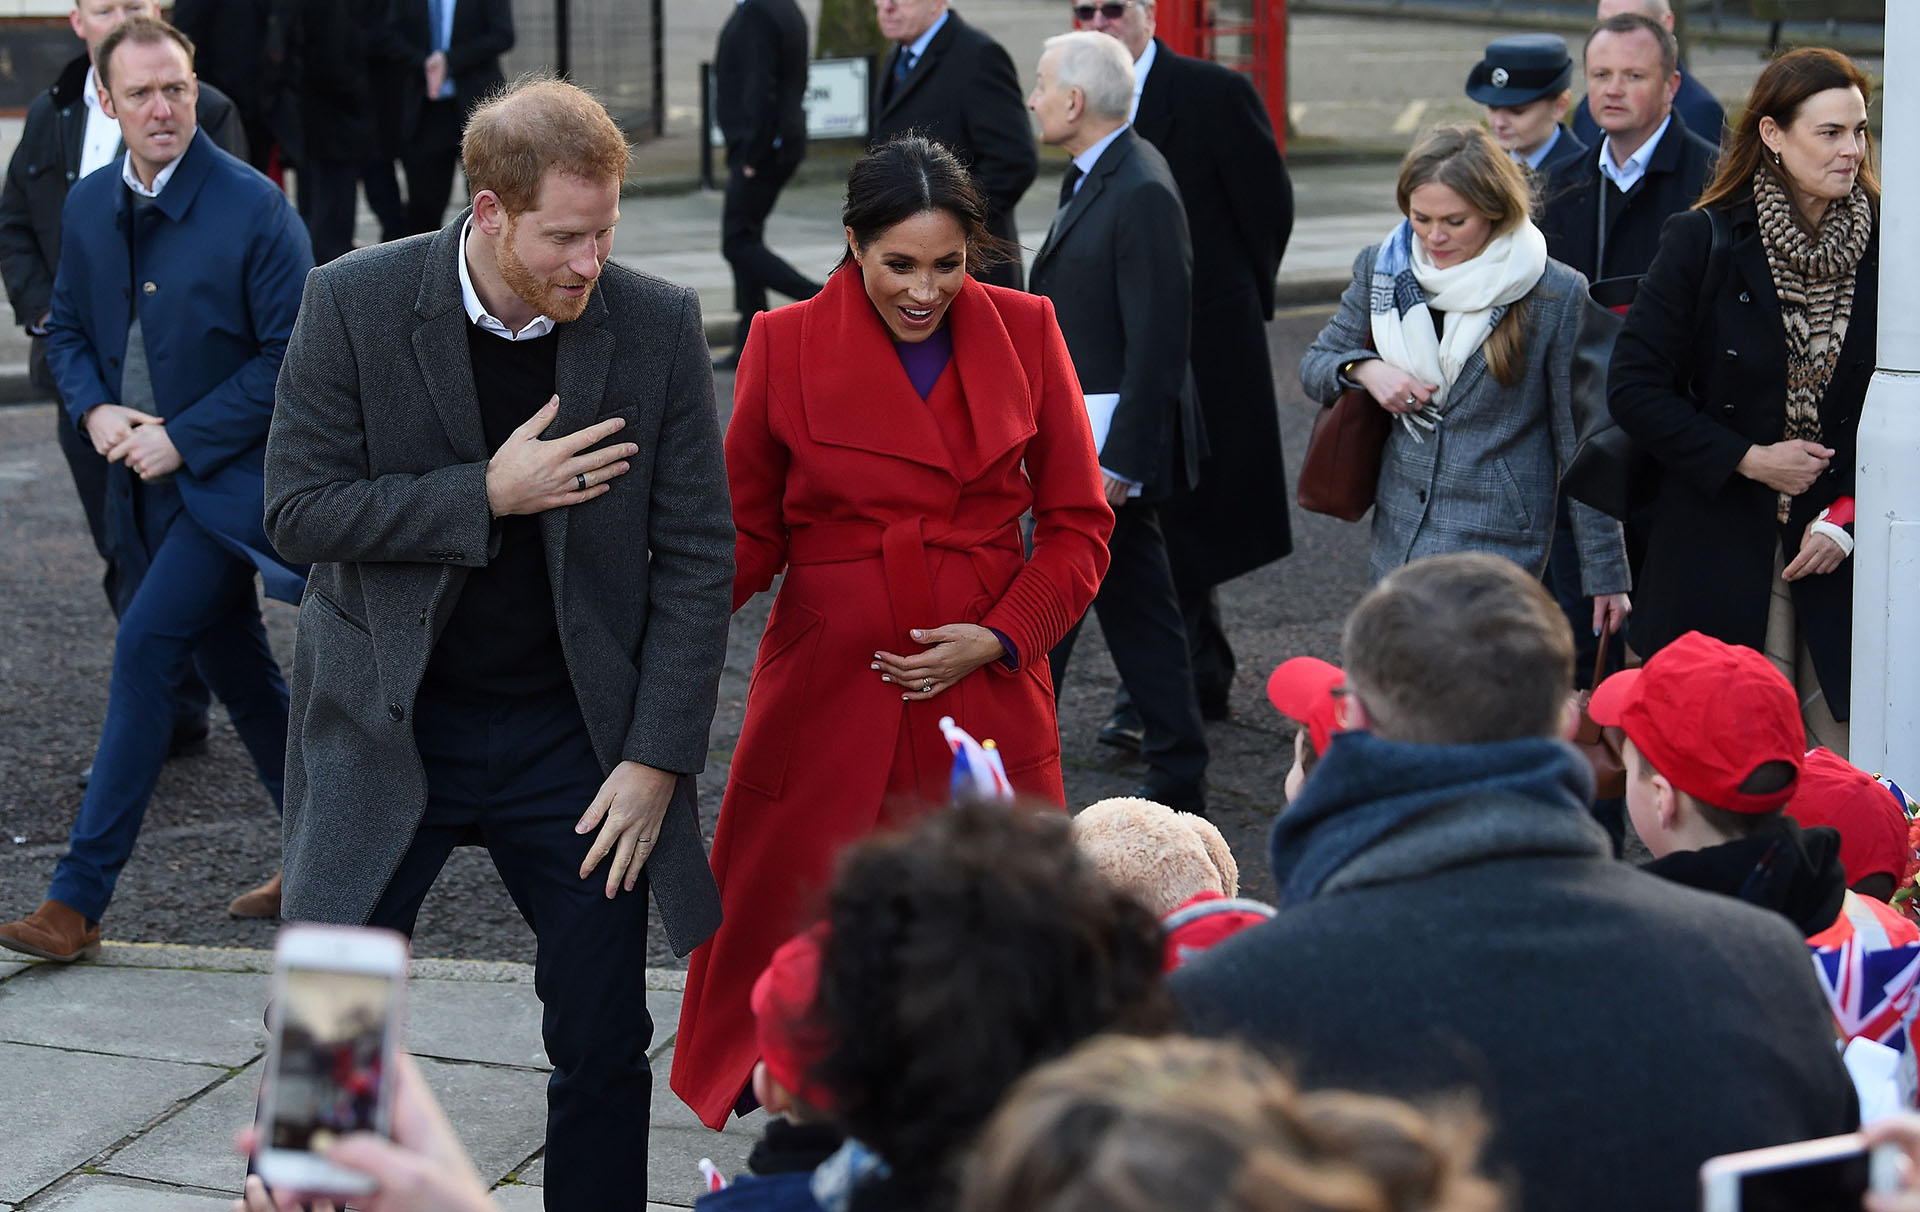 most popular royal name revealed